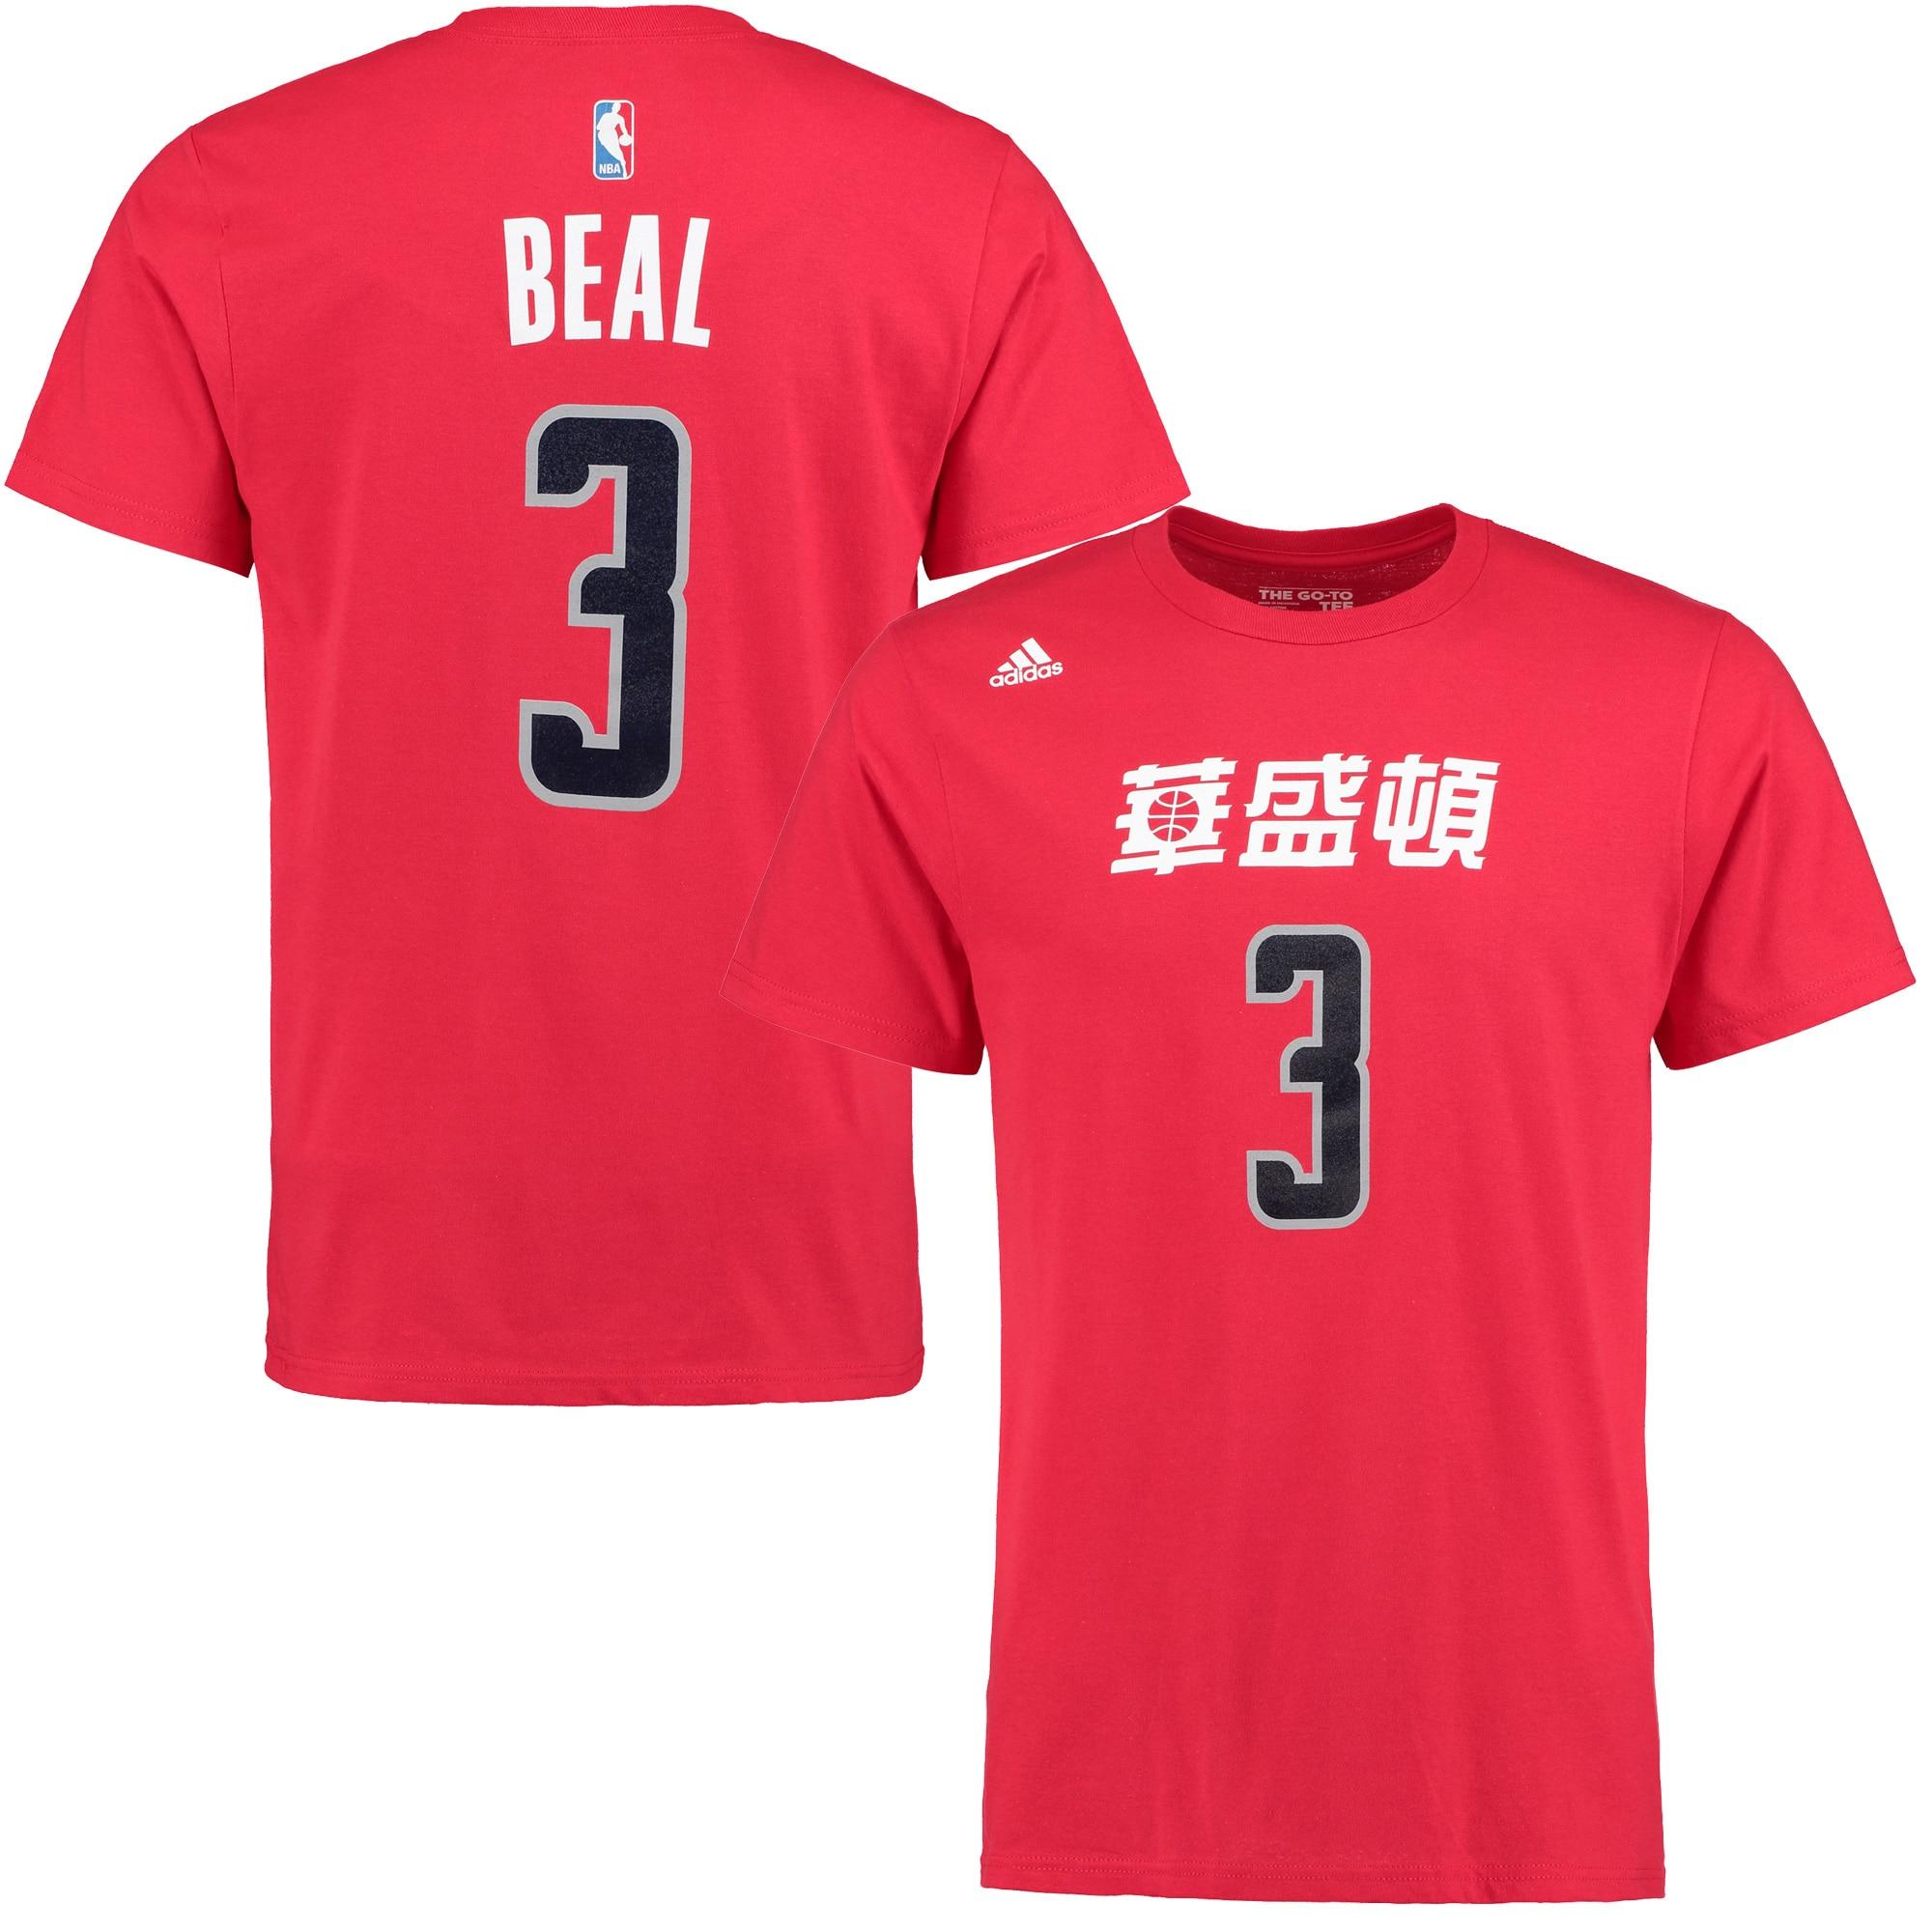 Bradley Beal Washington Wizards adidas 2016 Chinese New Year Name & Number T-Shirt - Red